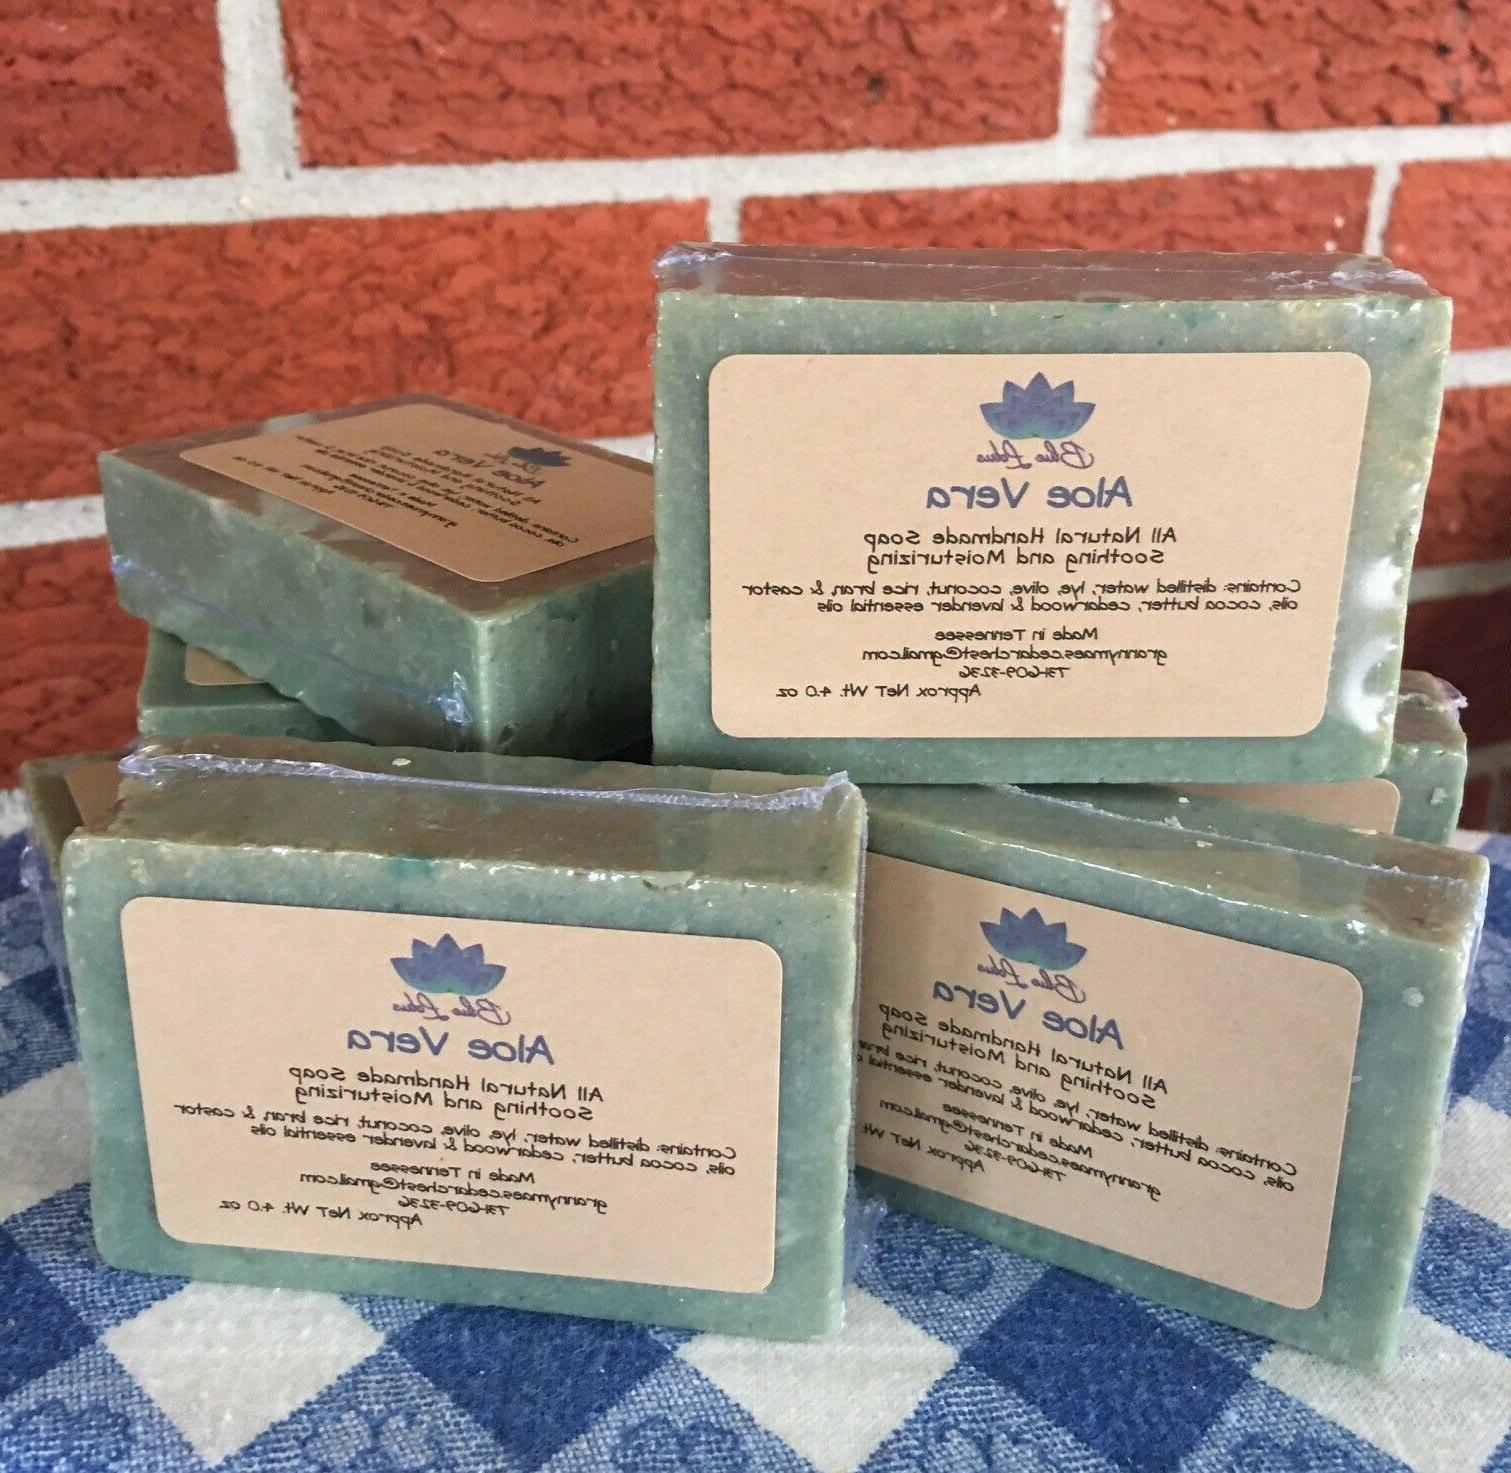 aloe vera all natural soap